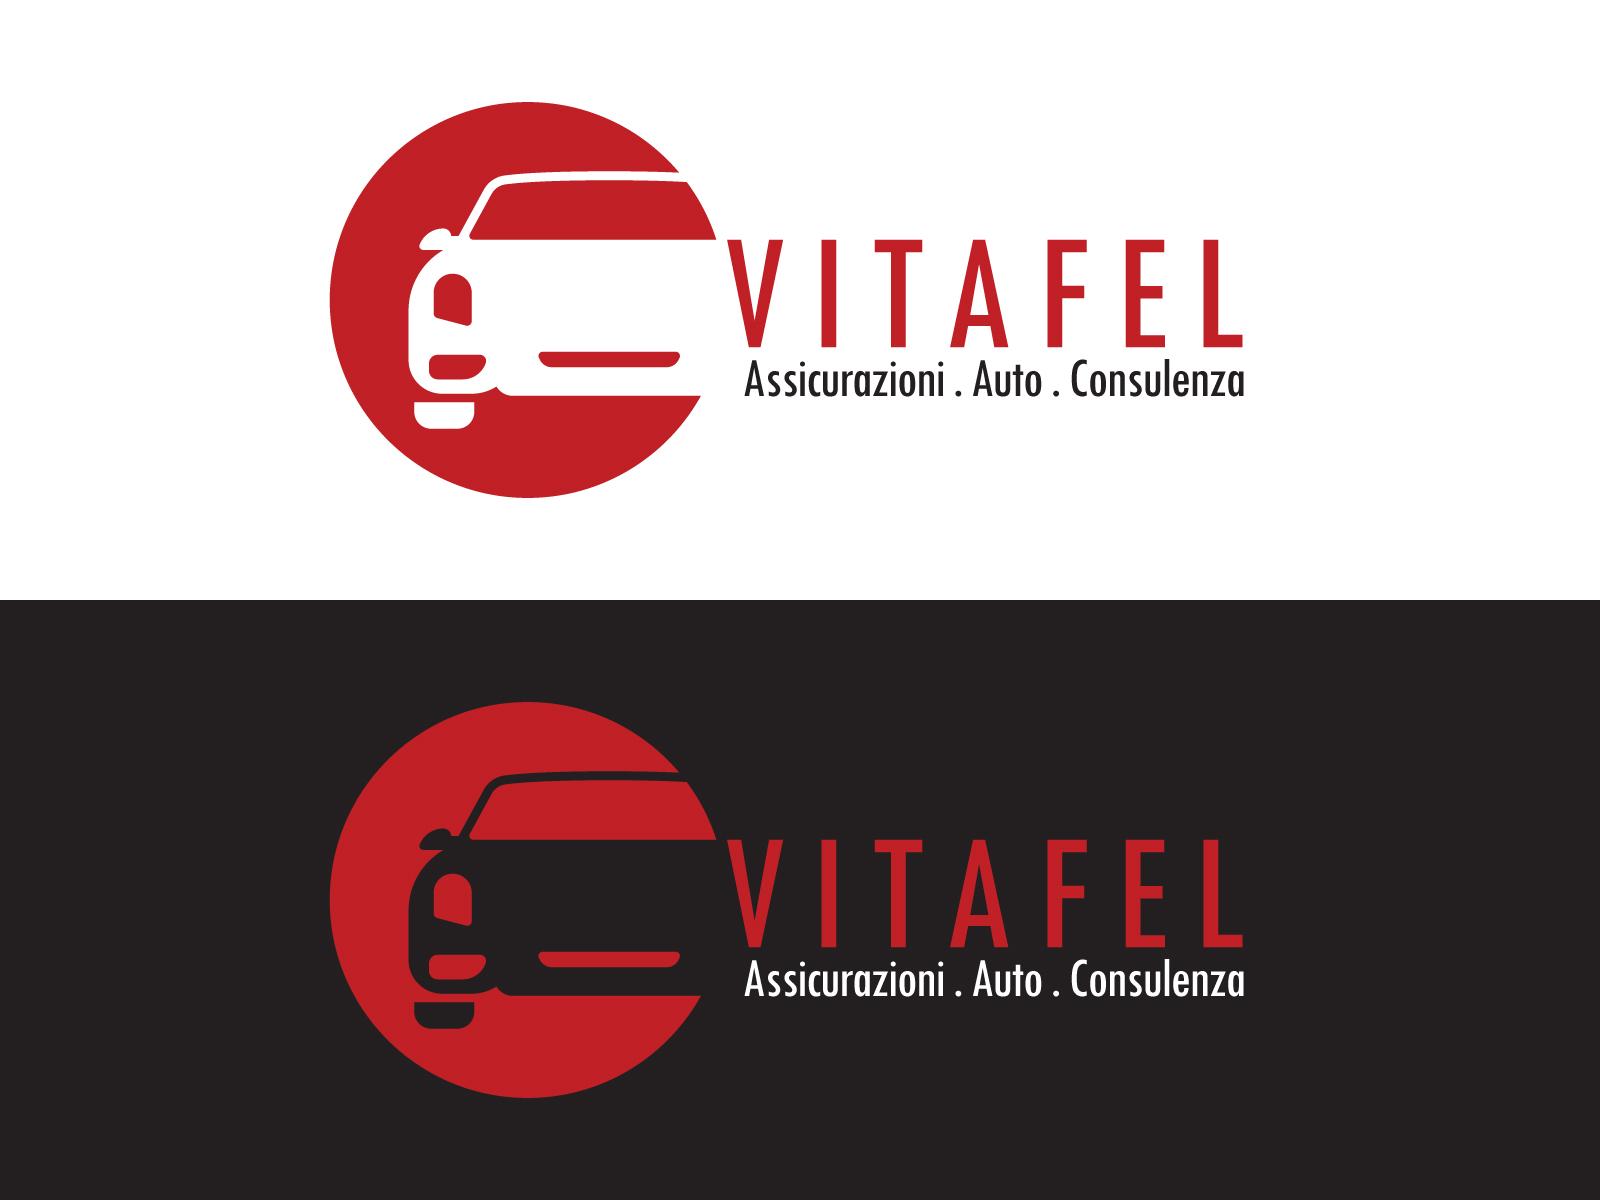 Vitafel Logo Design By Dennis On Dribbble